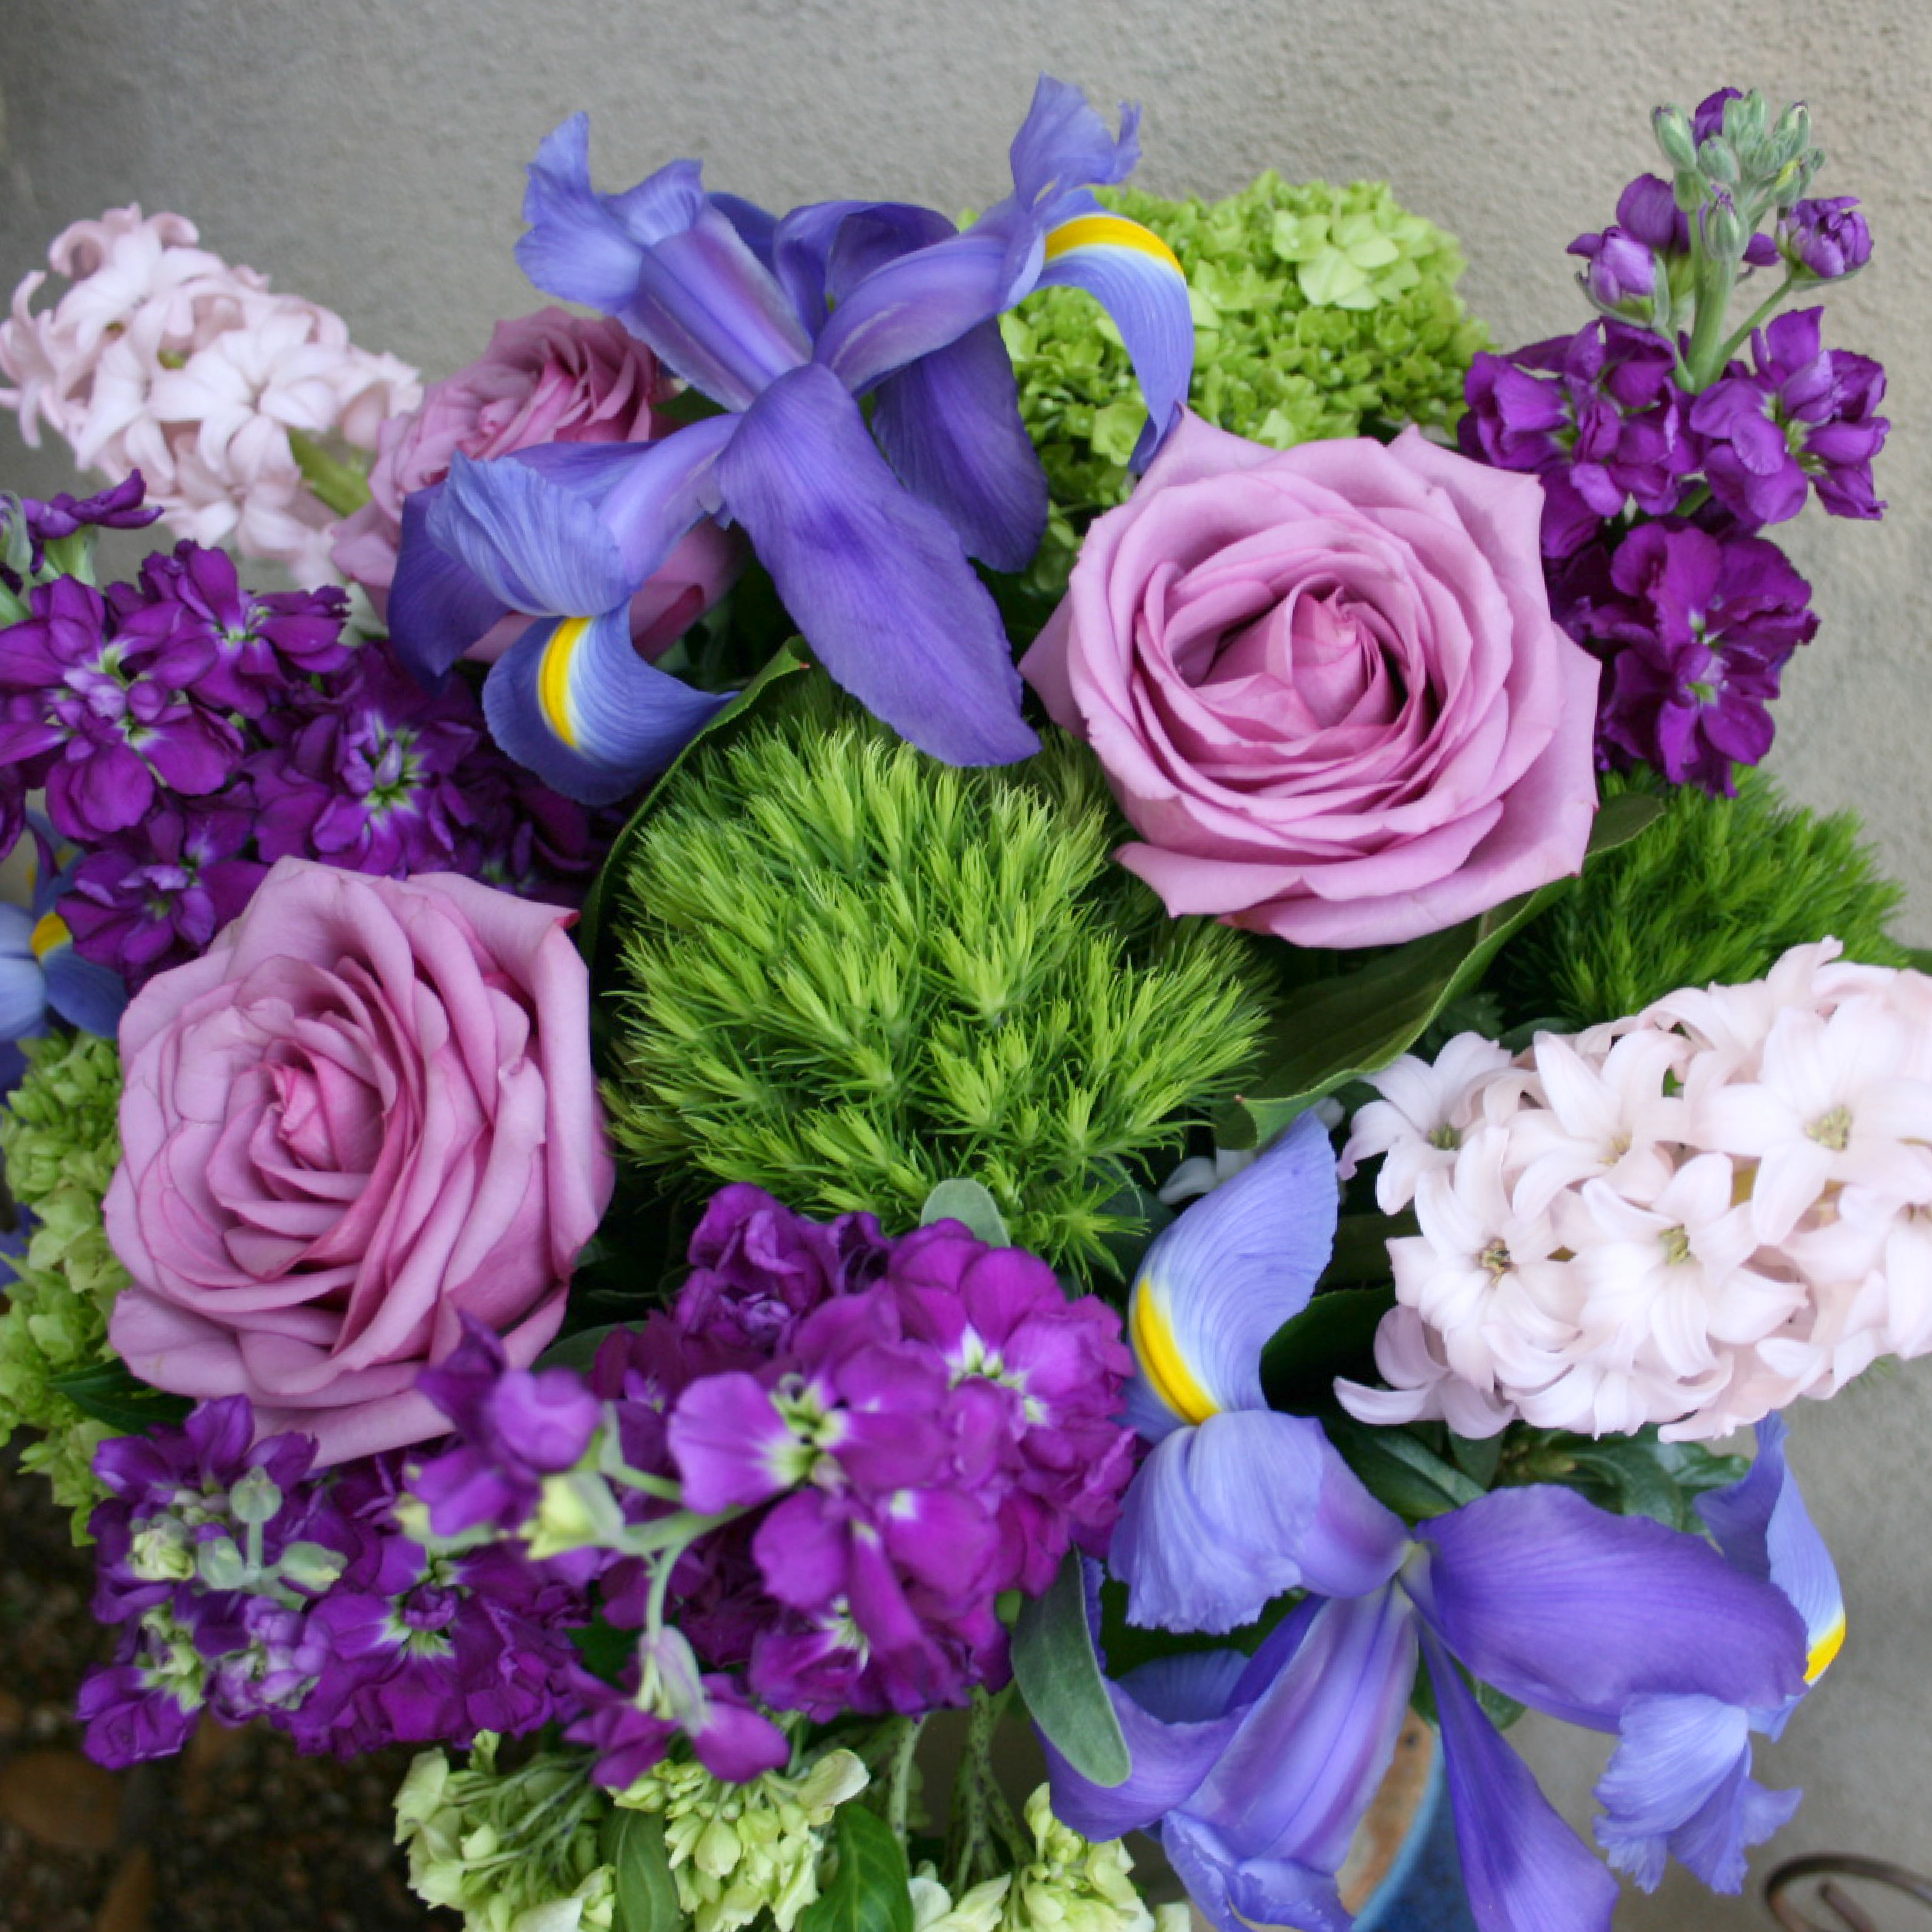 Bright Summer Arrangement Freytag's Florist Austin, TX